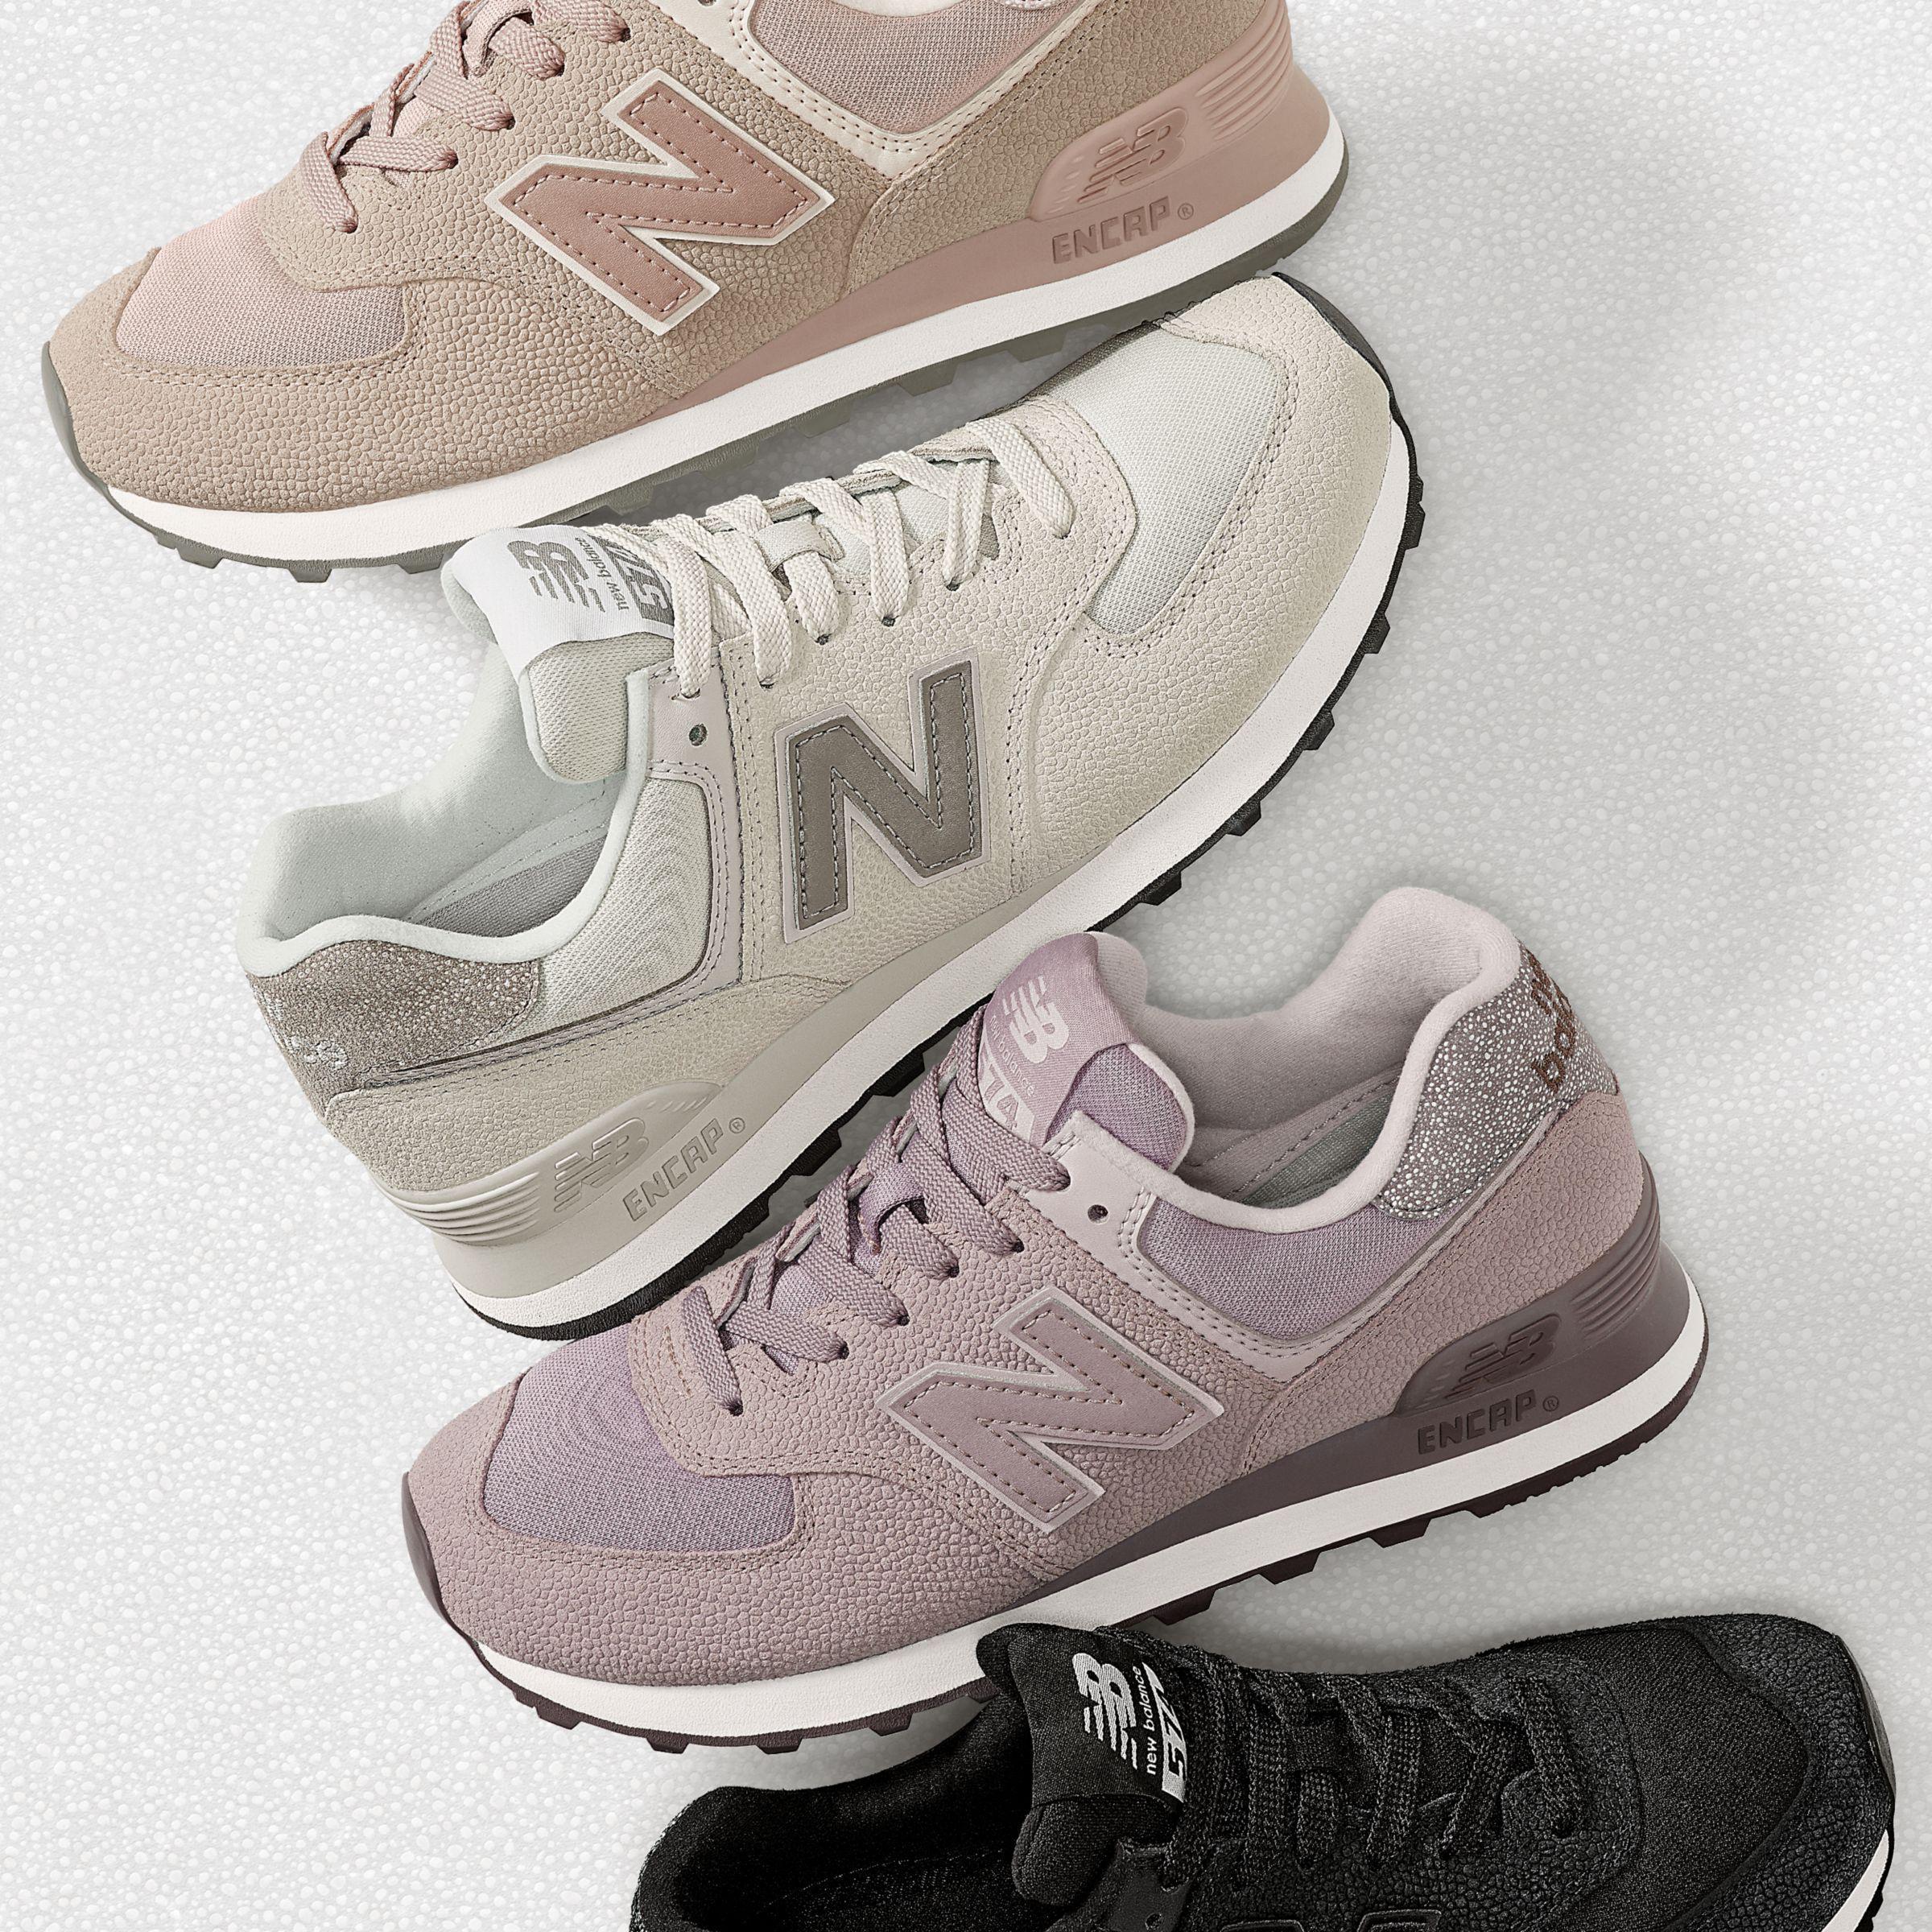 New Balance 574 Pebbled Street Women's